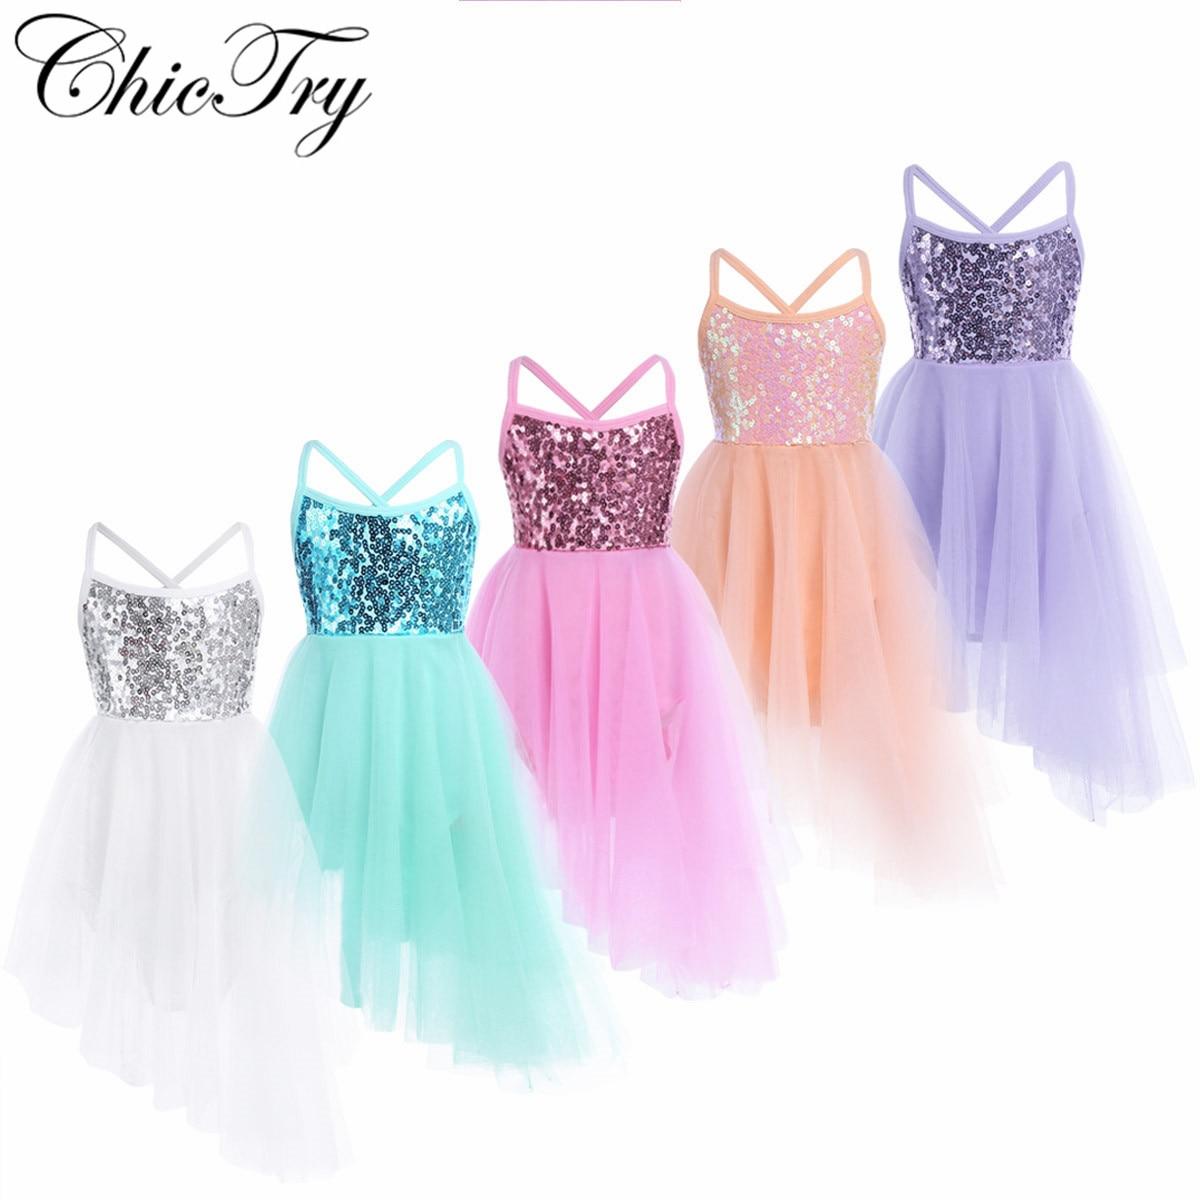 5306de32952e Buy dance wear children and get free shipping on AliExpress.com